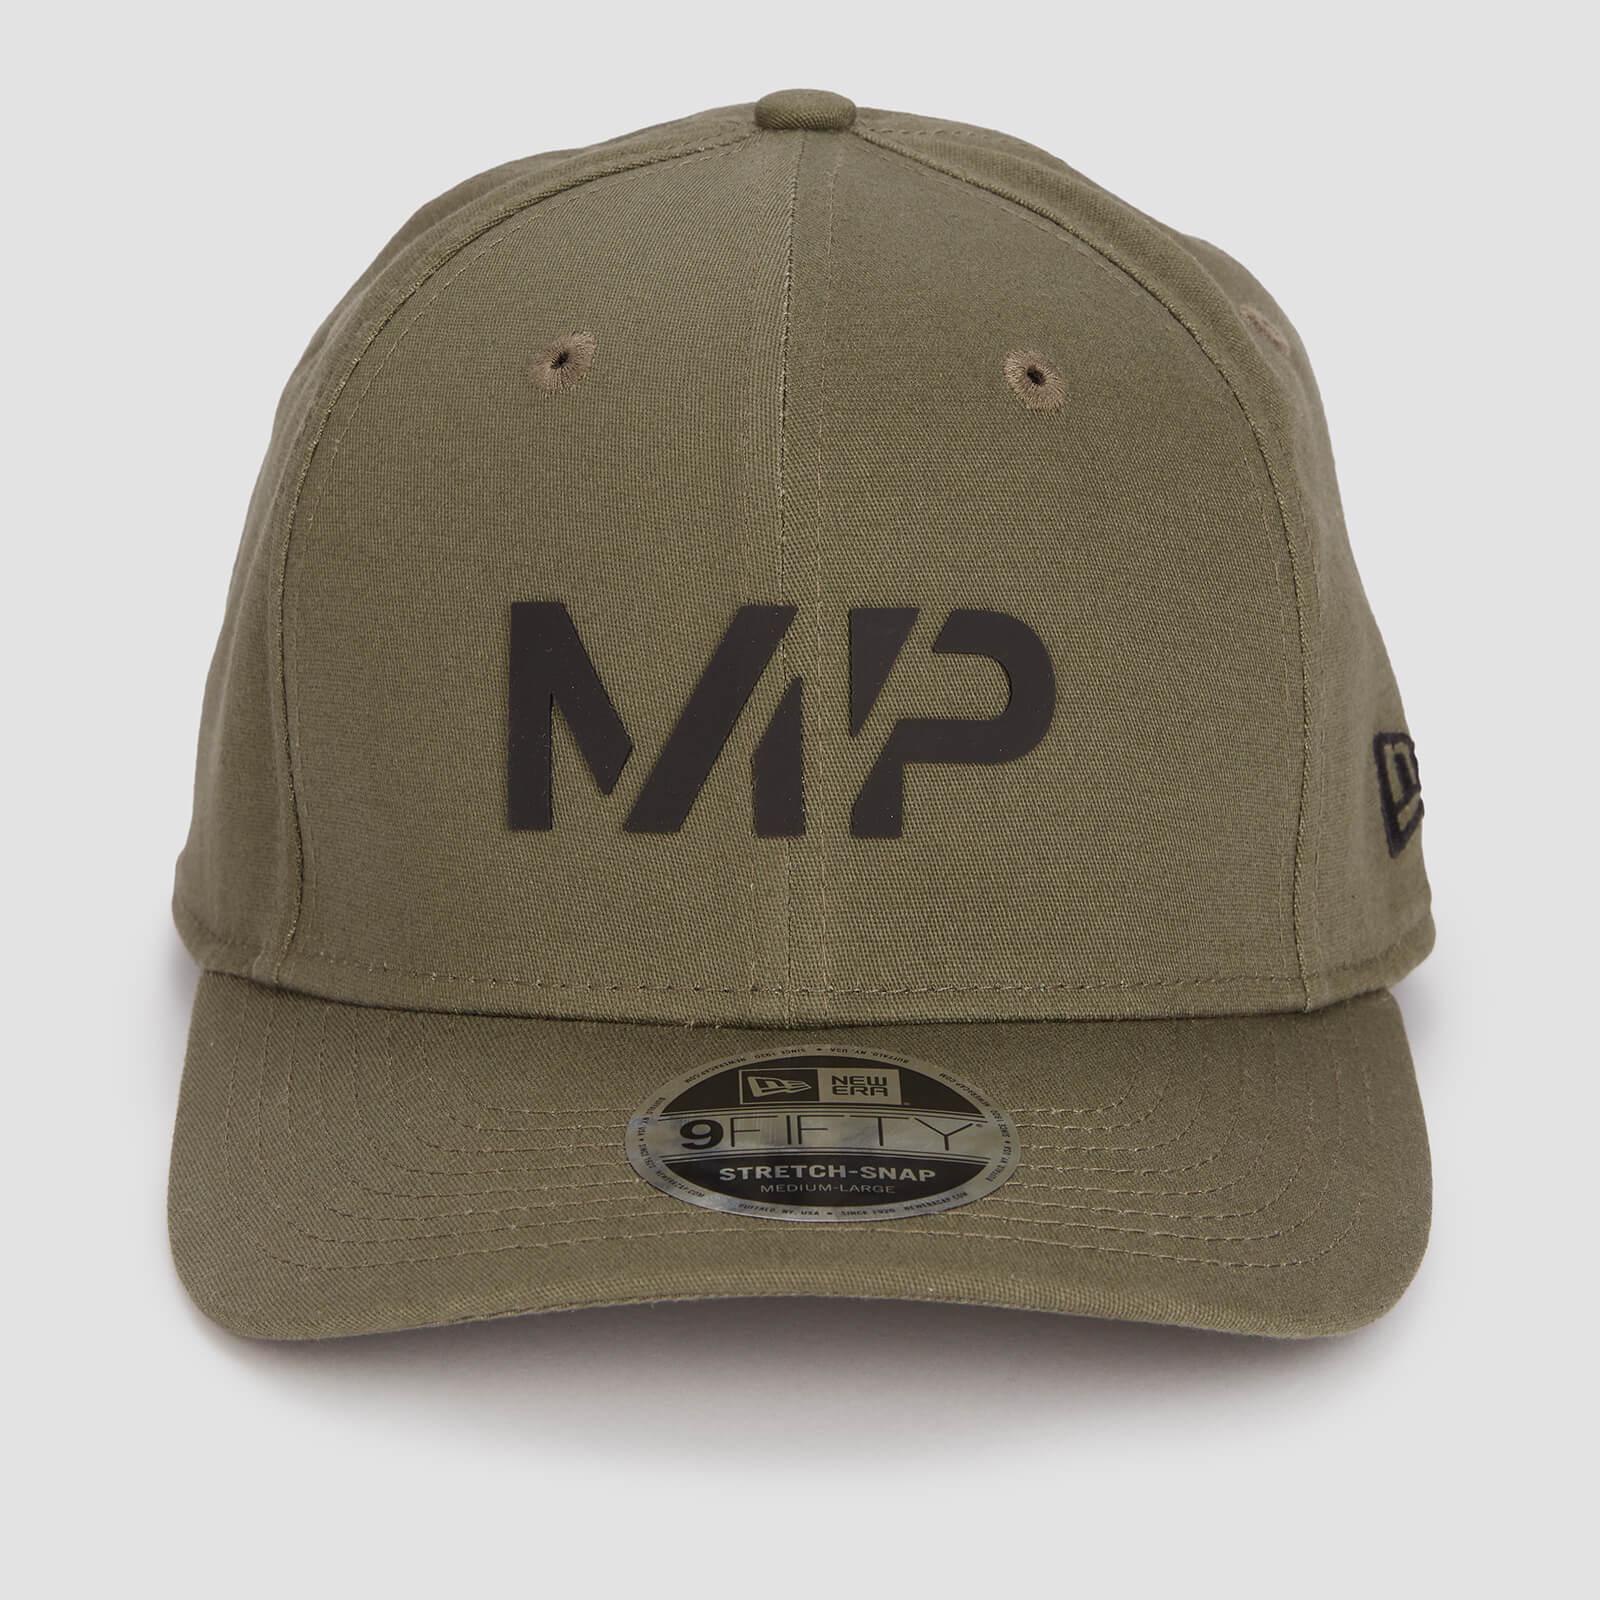 MP New Era 9FIFTY Stretch Snapback - Dark Olive/Black - S-M